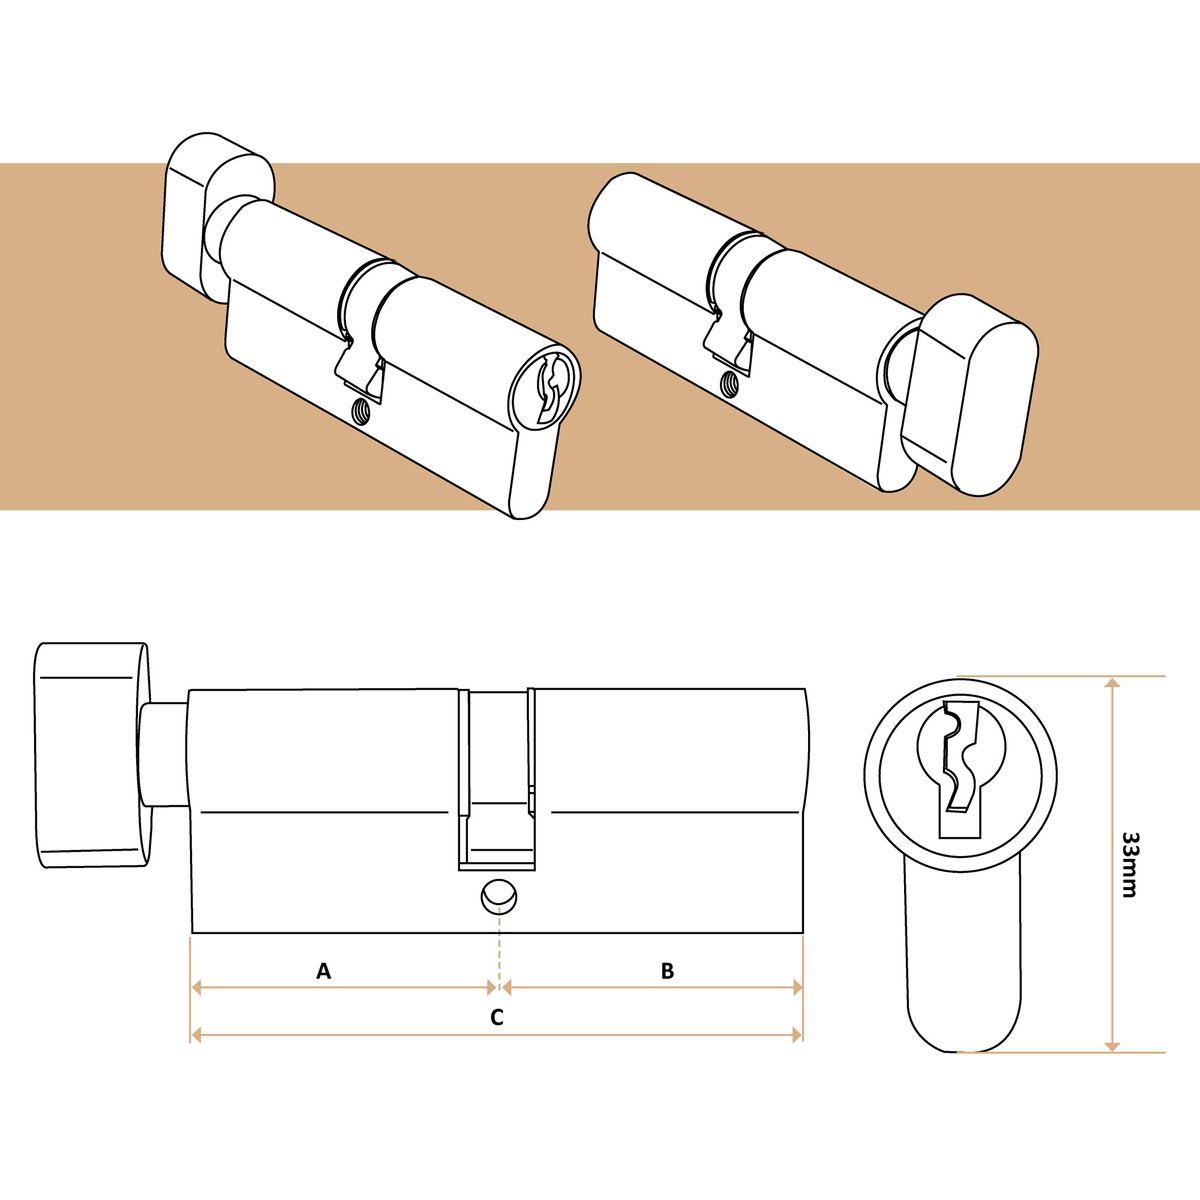 Schlie/ßzylinder mit Knauf Profilzylinder inkl T/ürschloss 3 Schl/üsseln 45 x 50mm Zylinderschloss